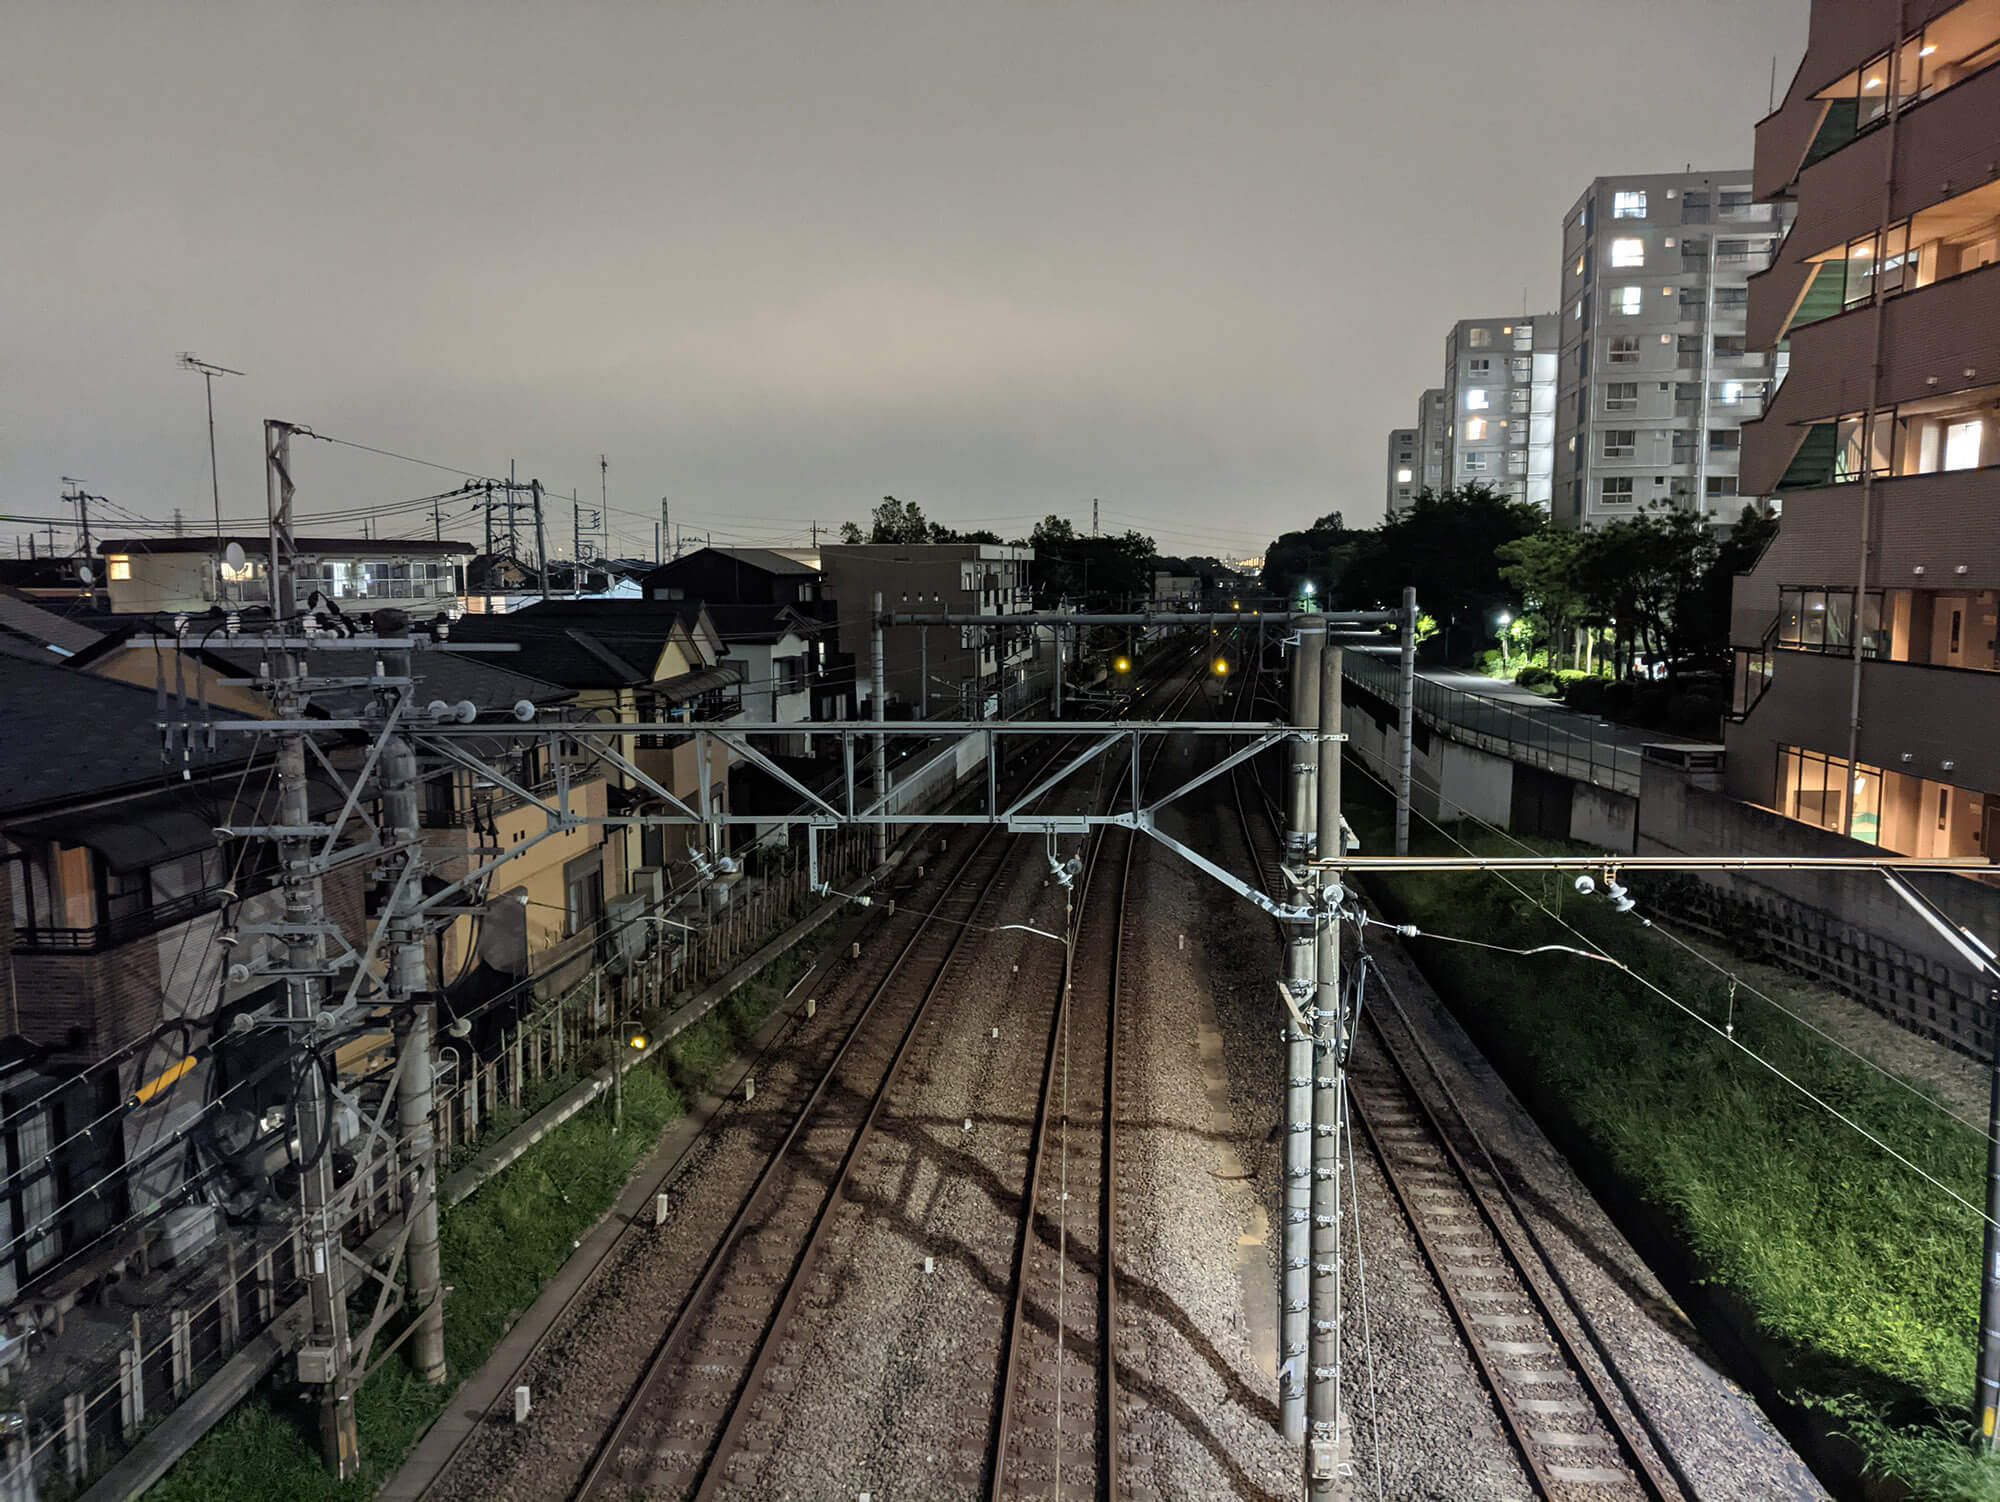 moto g30にGCamをインストールして撮影した線路沿いの画像